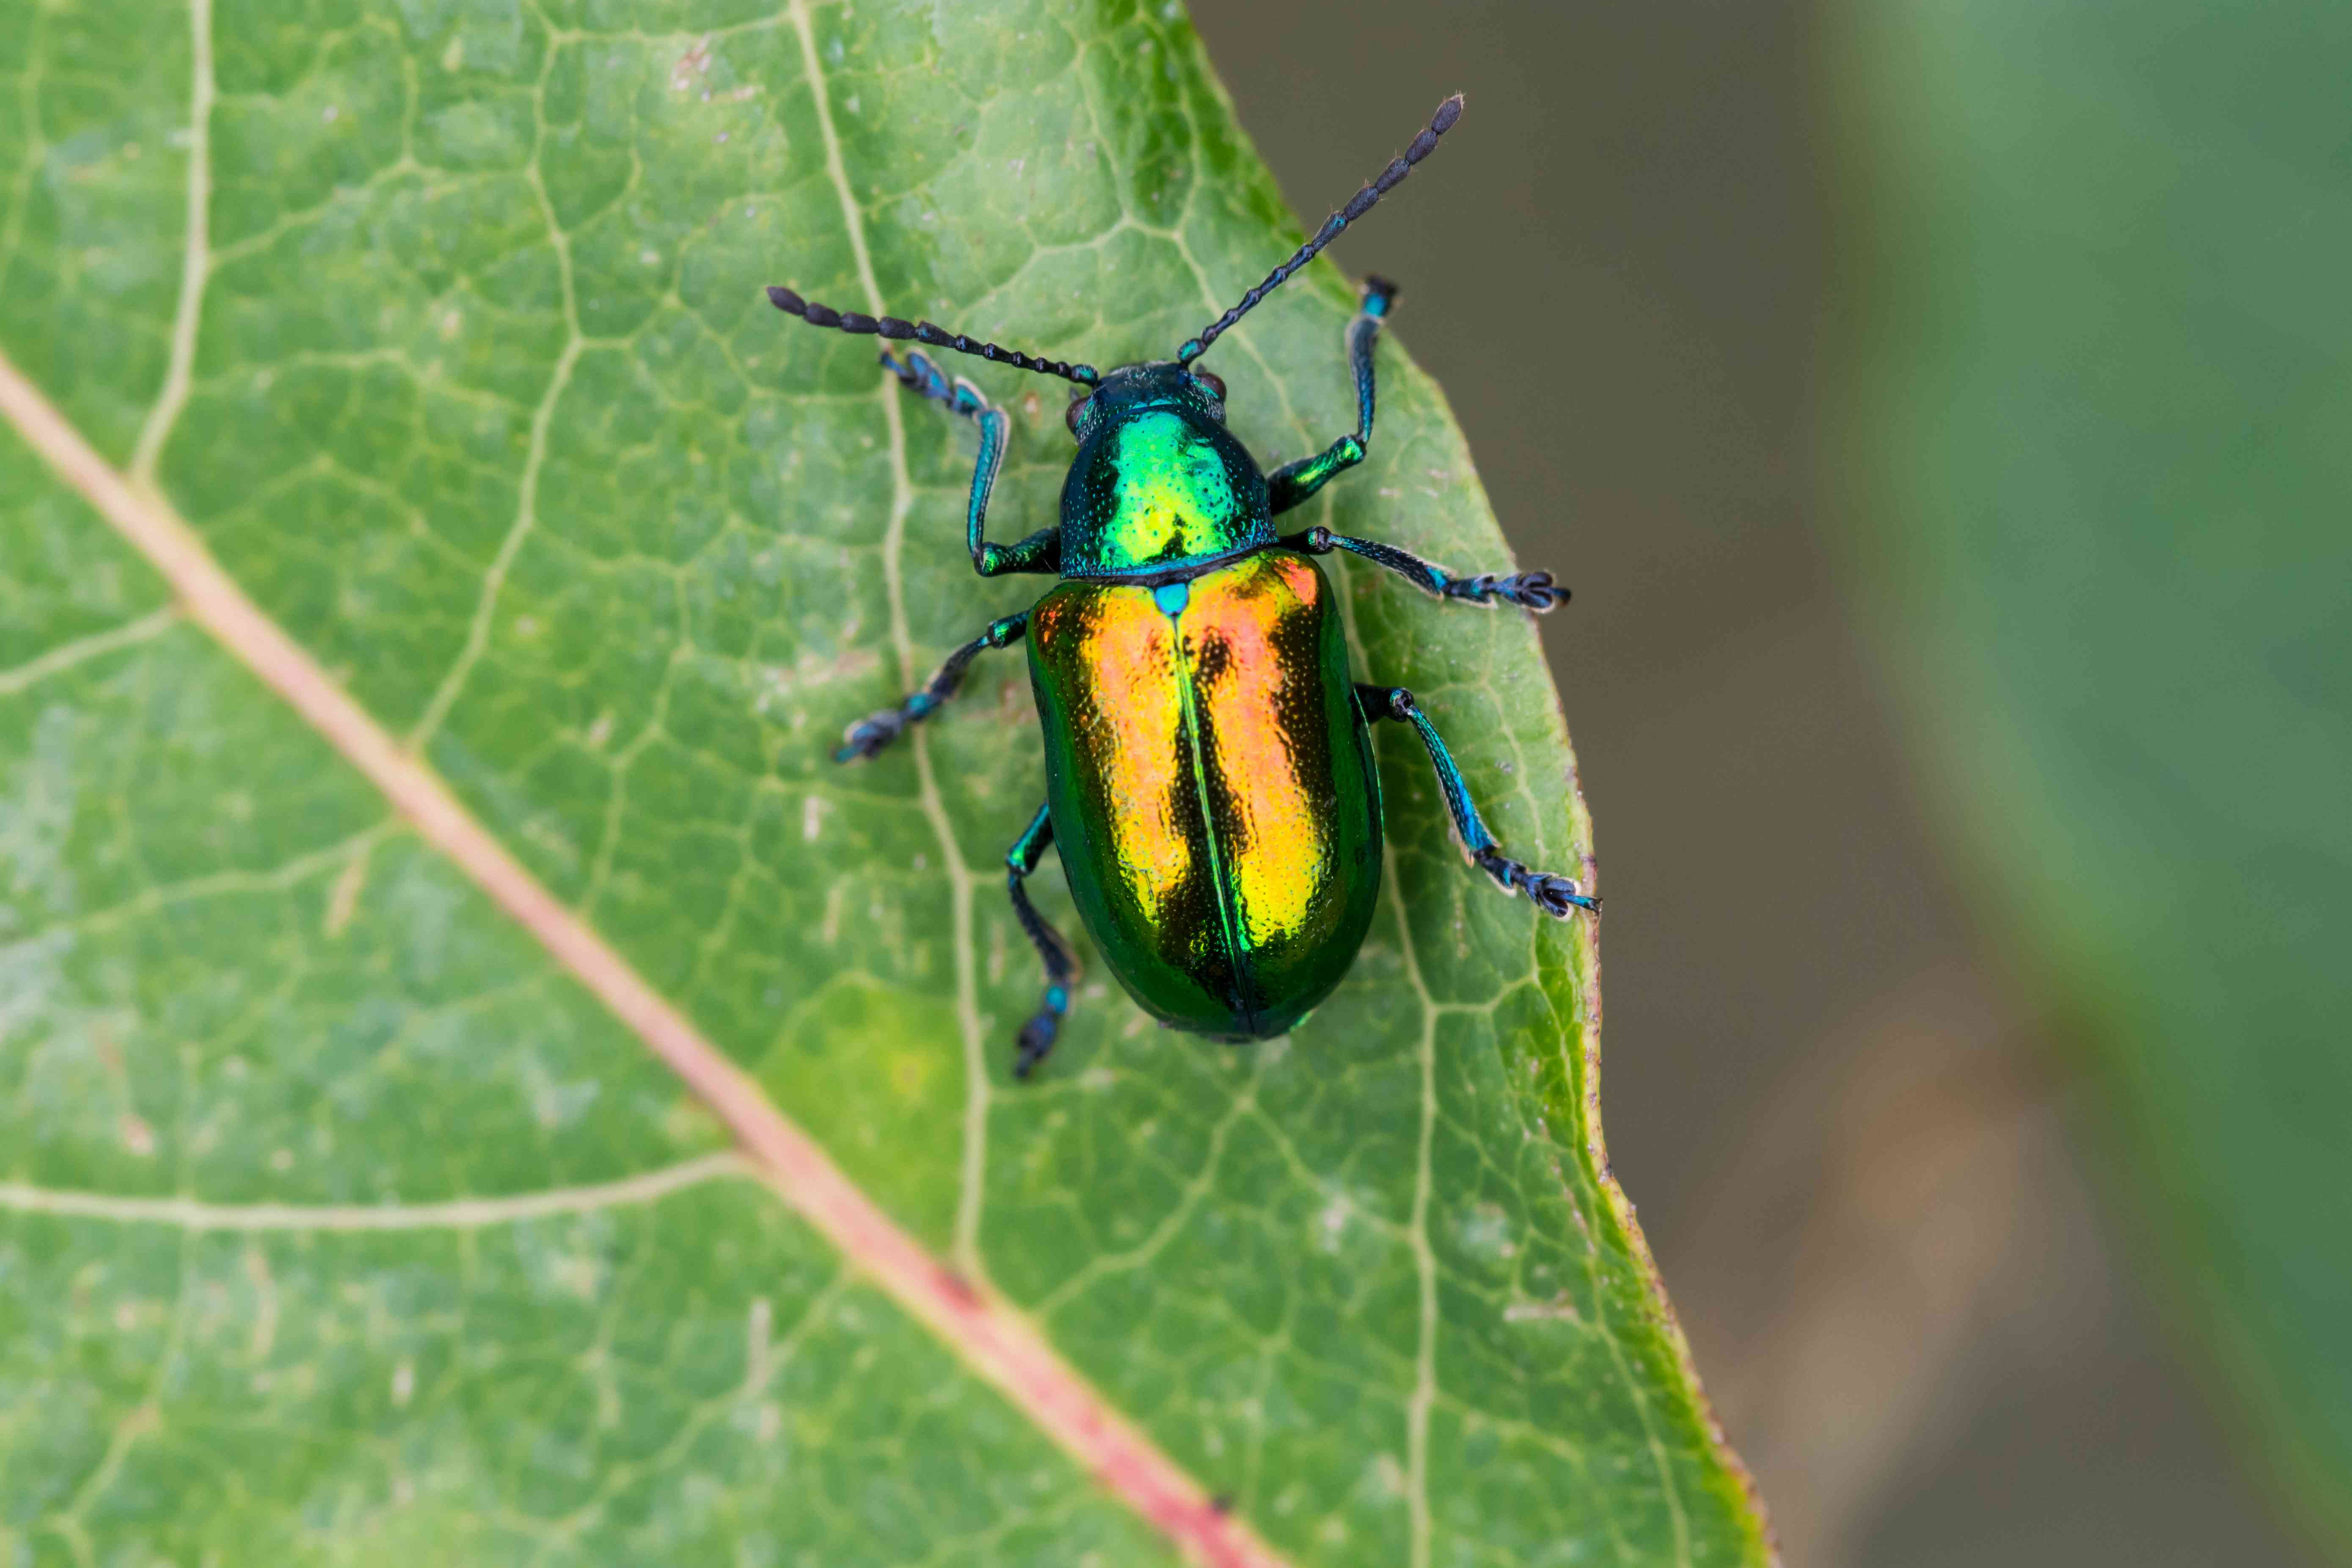 Metallic dogbane beetle on a leaf